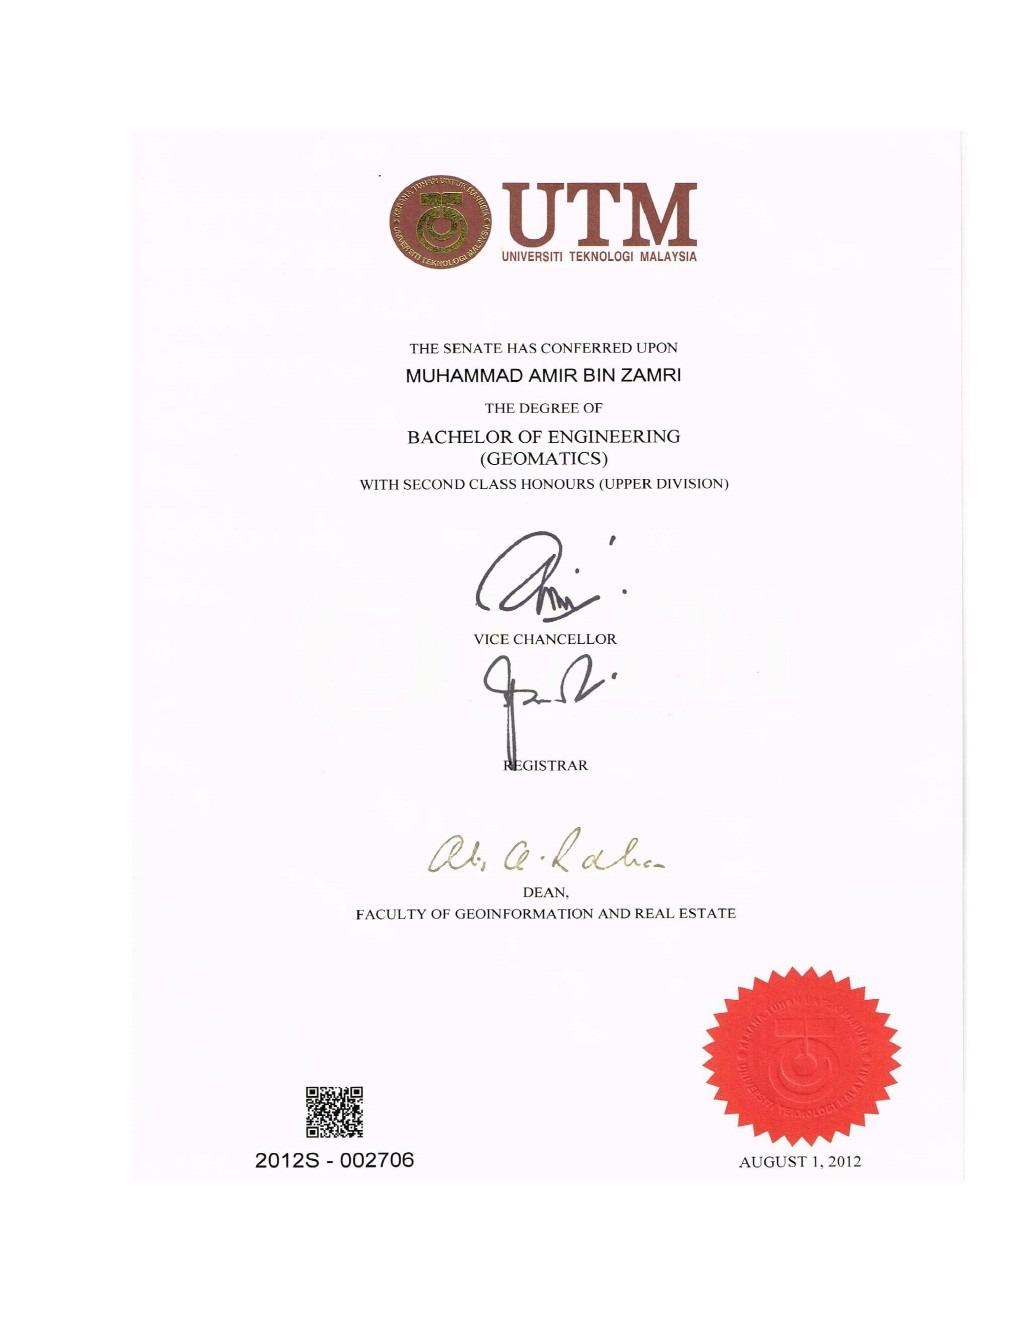 muhammad amir zamri bayt com at university of technology